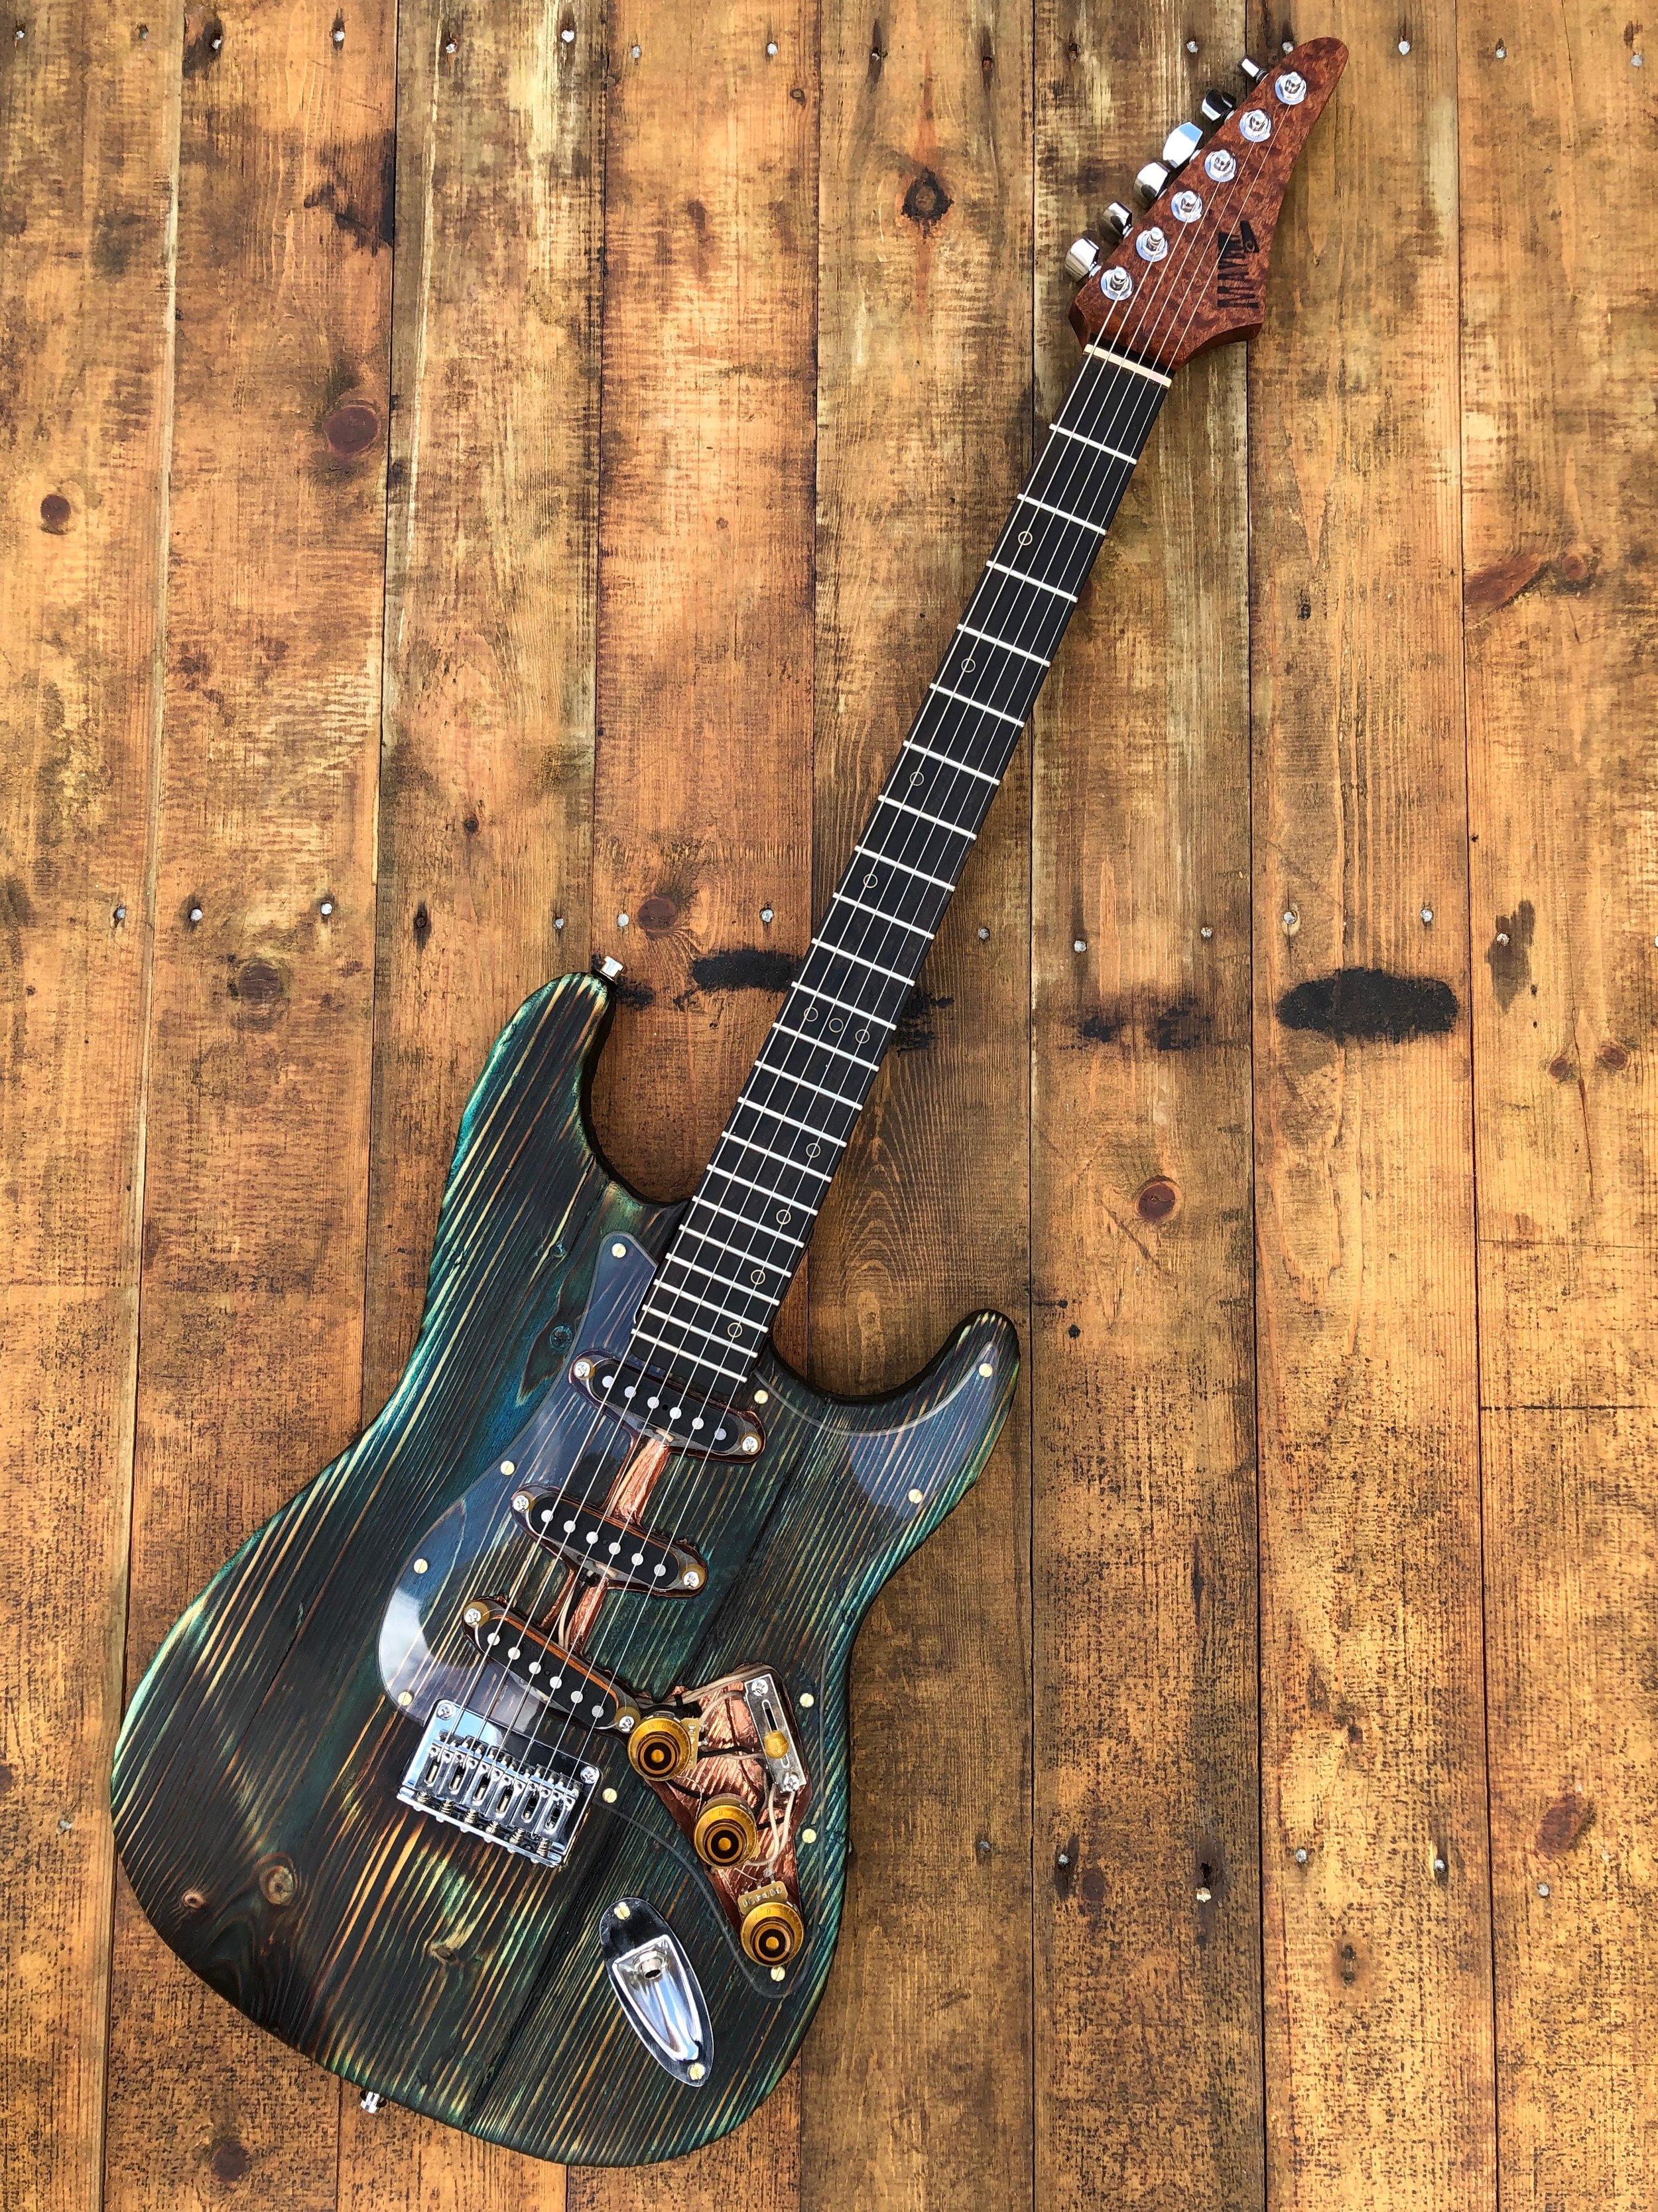 Joes guitar 2.jpeg